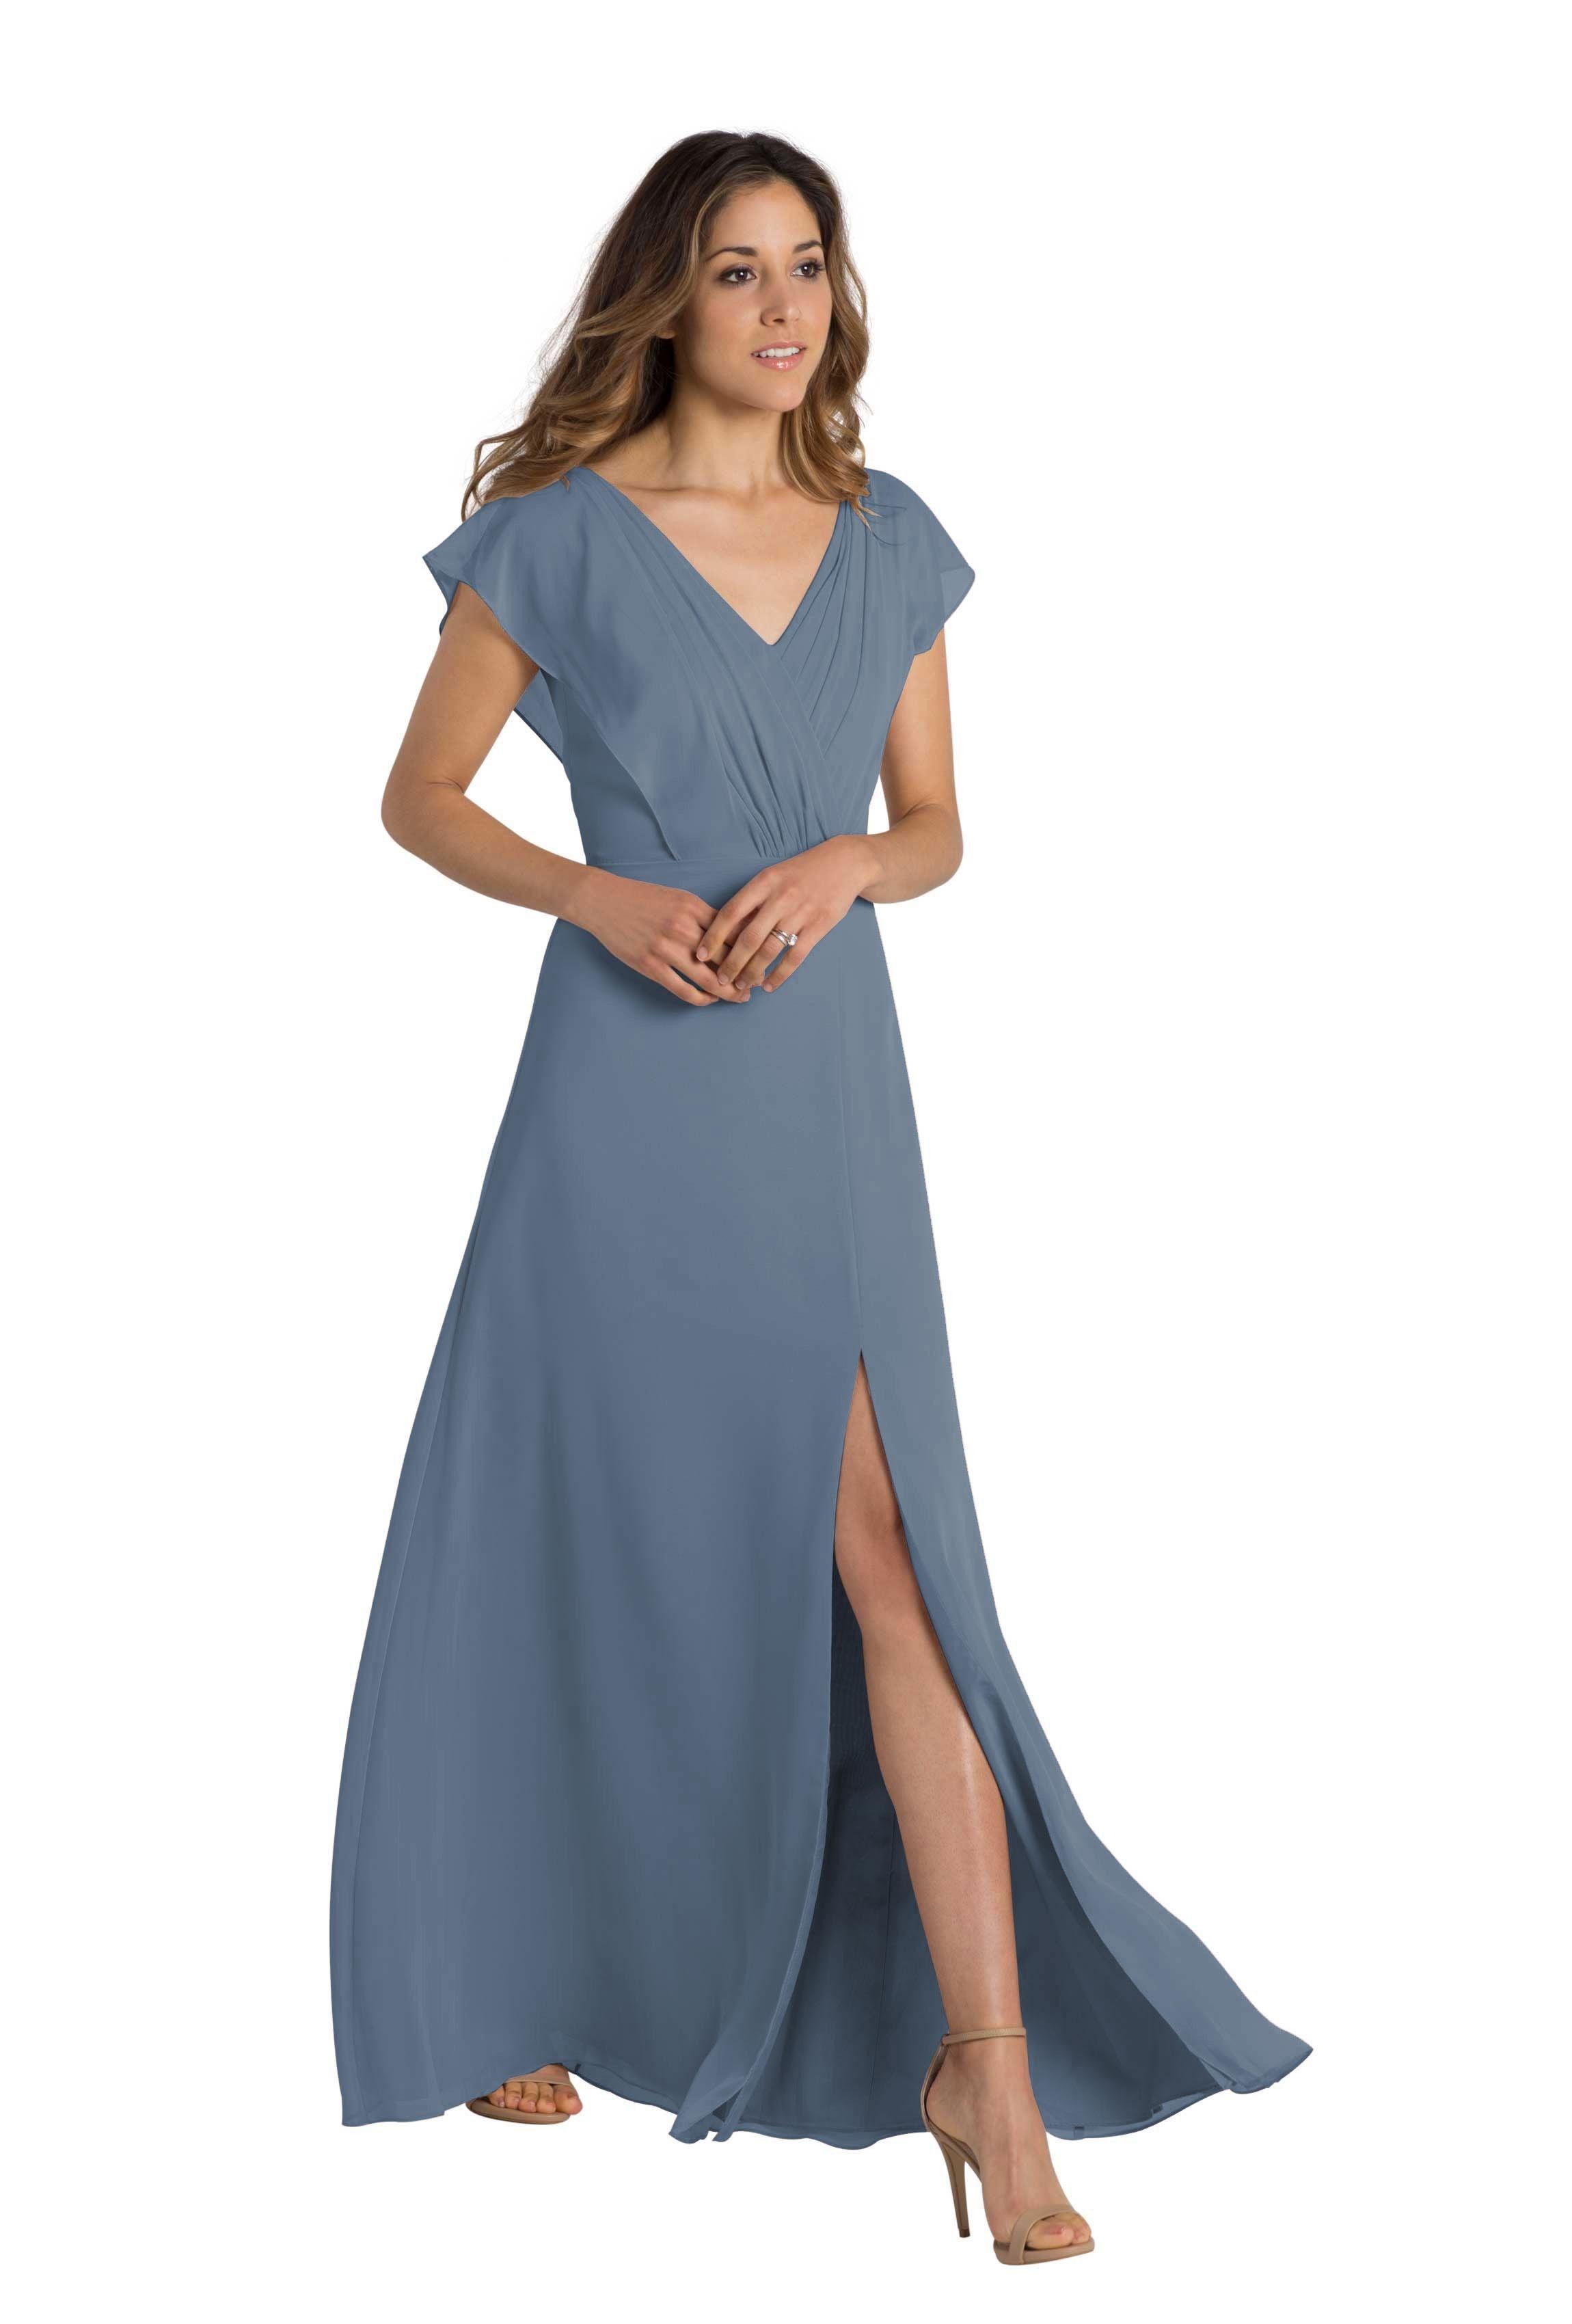 Monique lhuillier gwen chiffon bridesmaid dresses dress ideas a floor length sleeved chiffon bridesmaid dress with cutout back in six colors ombrellifo Choice Image